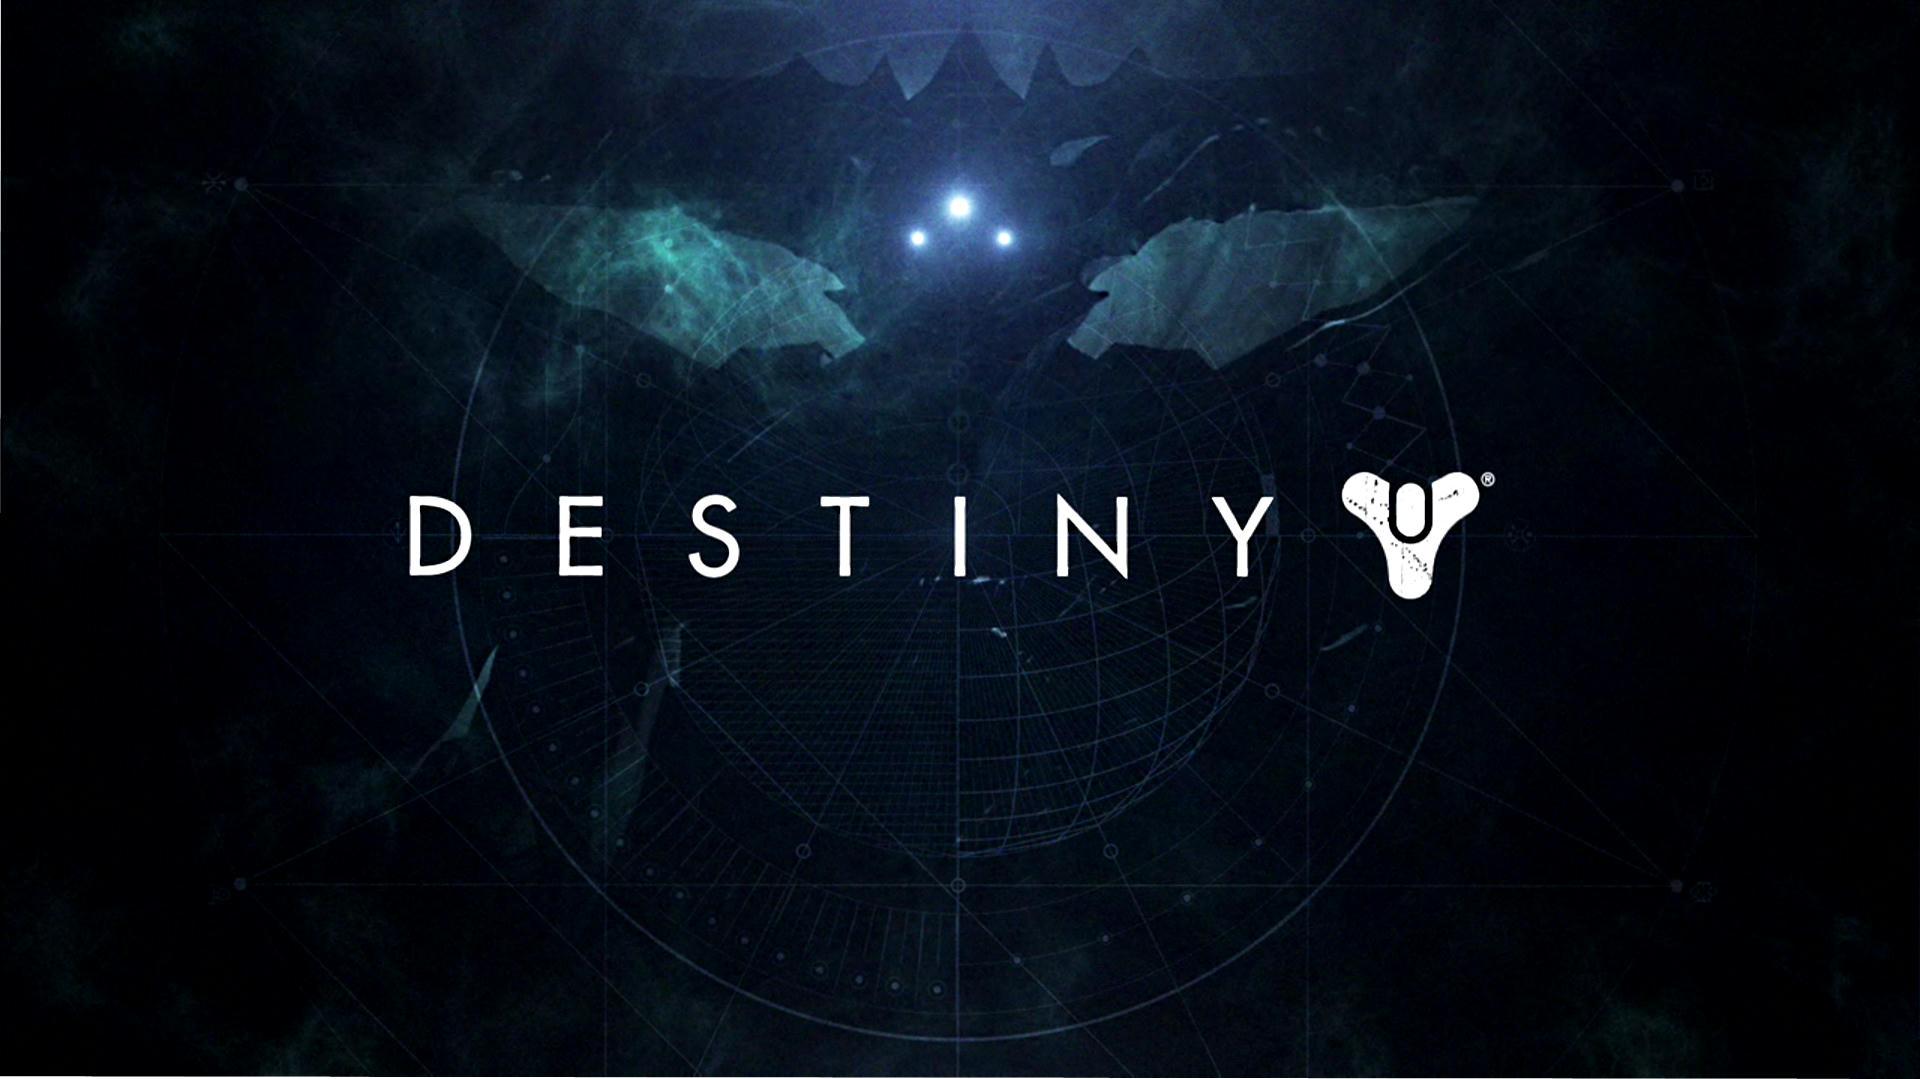 Destiny The Taken King Wallpaper: All - Destiny Taken King Wallpaper